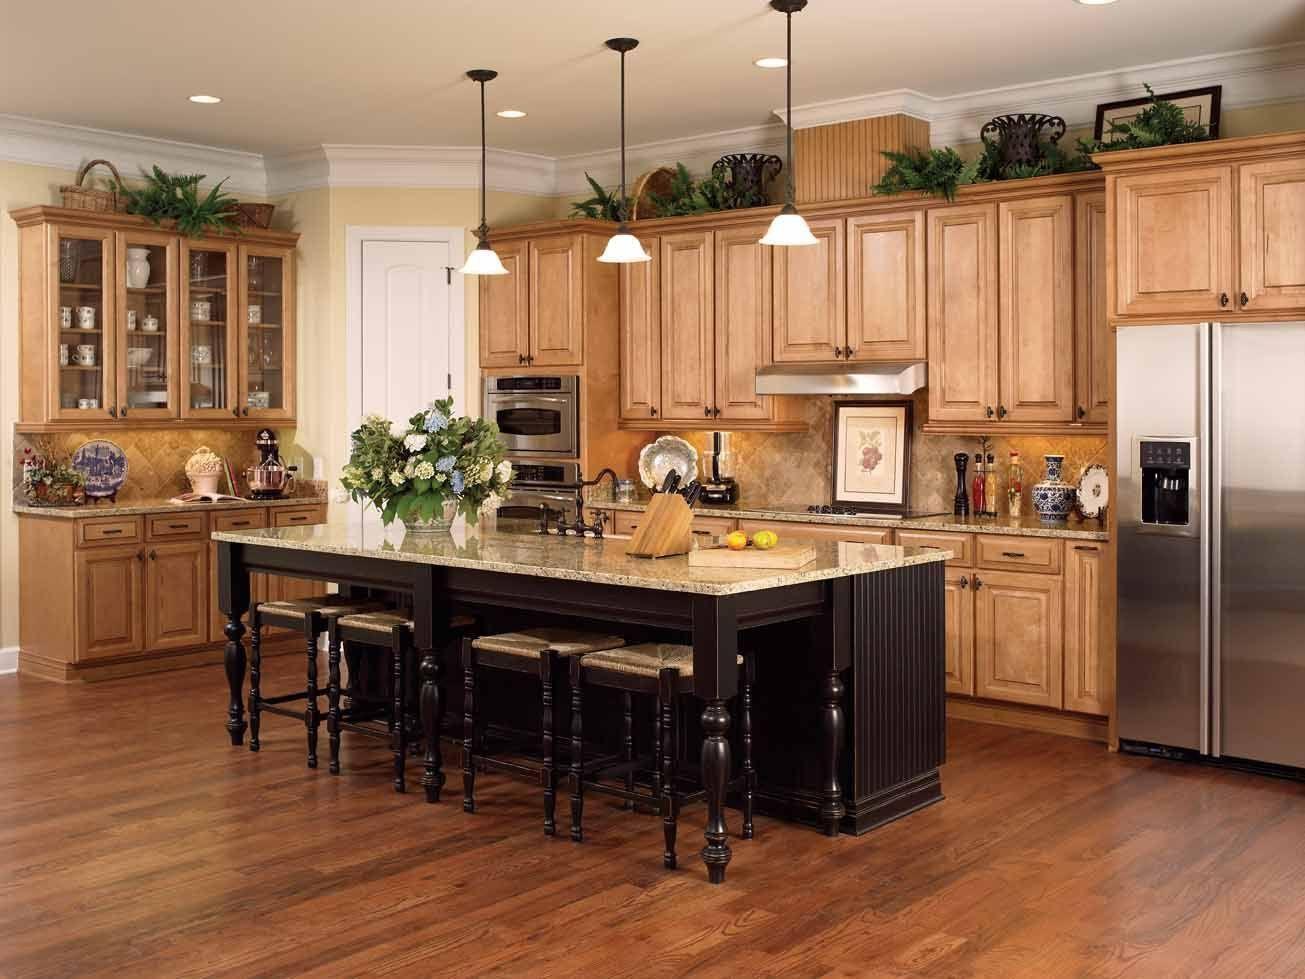 Best Of Maple Wood Kitchen Cabinets Custom Kitchen Cabinets Maple Kitchen Cabinets Kitchen Renovation